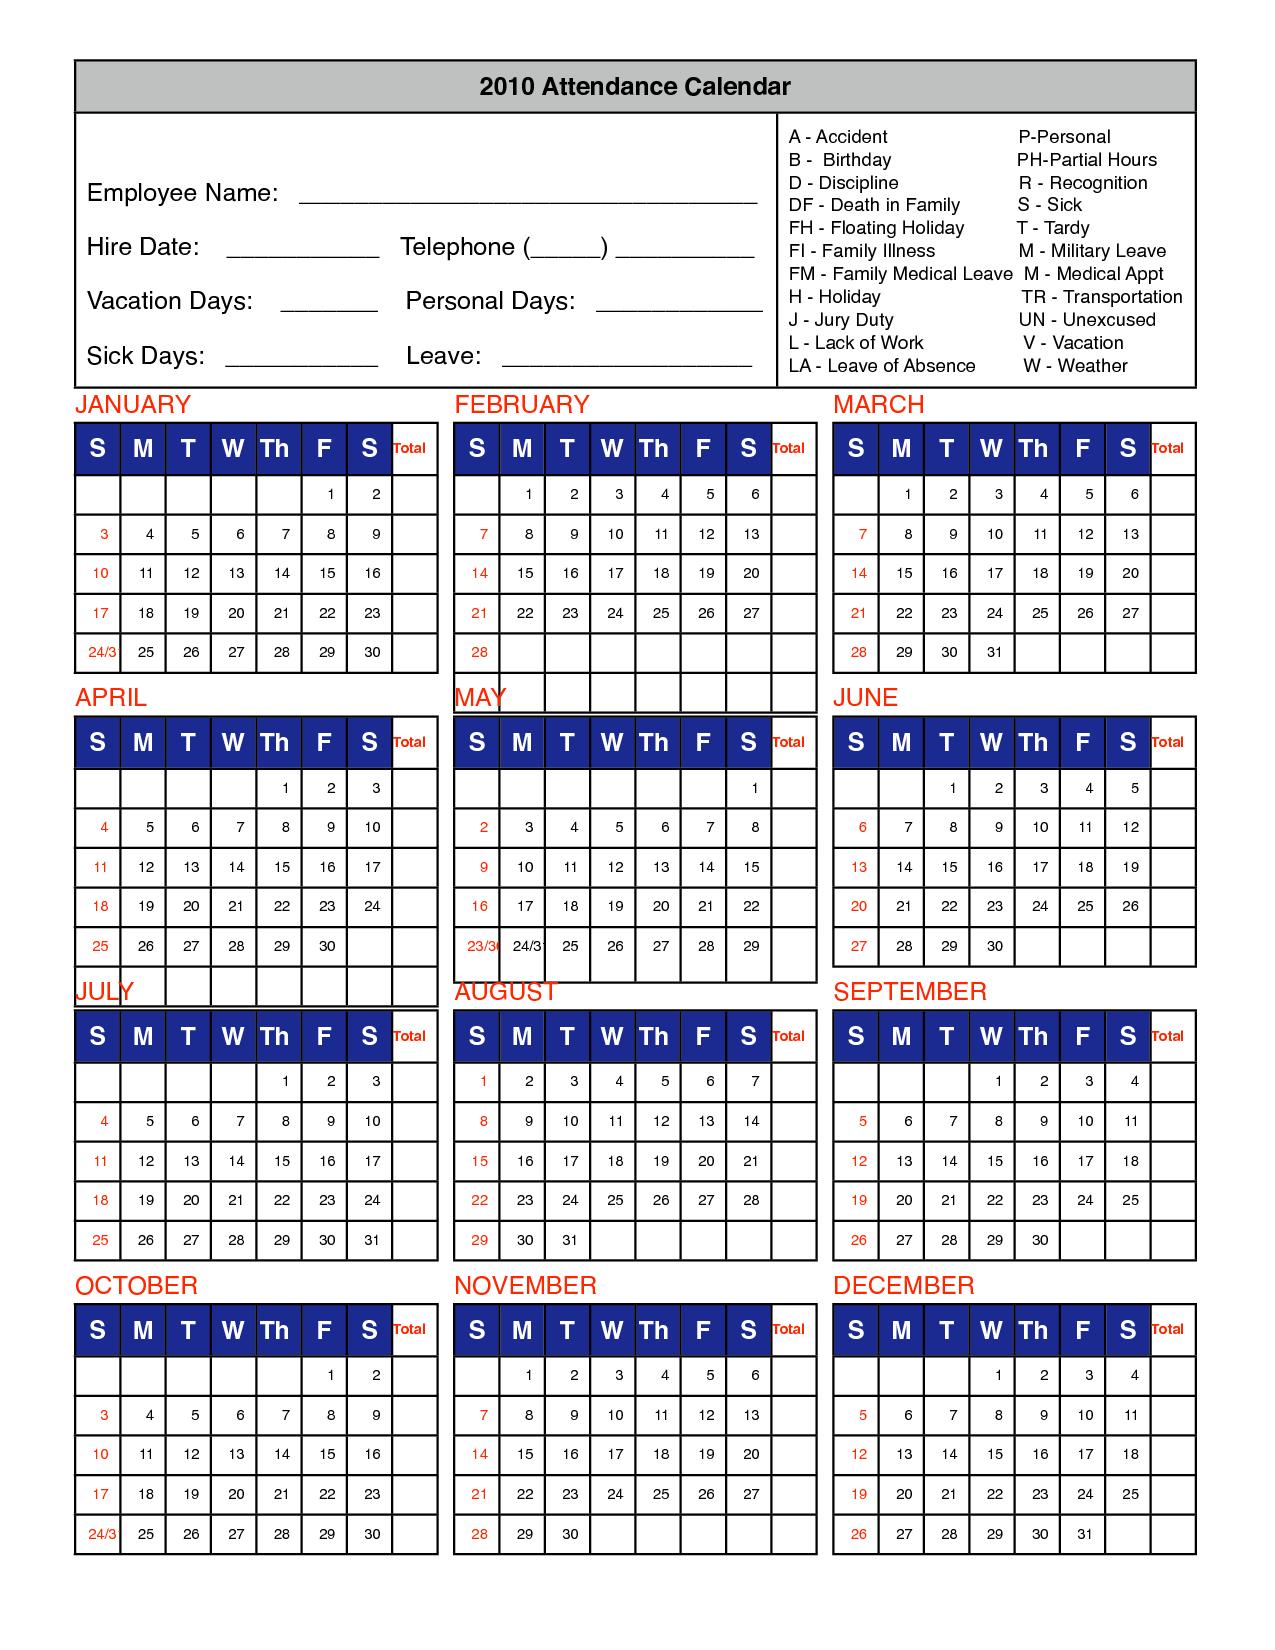 2020 Employee Attendance Calendar Printable - Teke.wpart.co